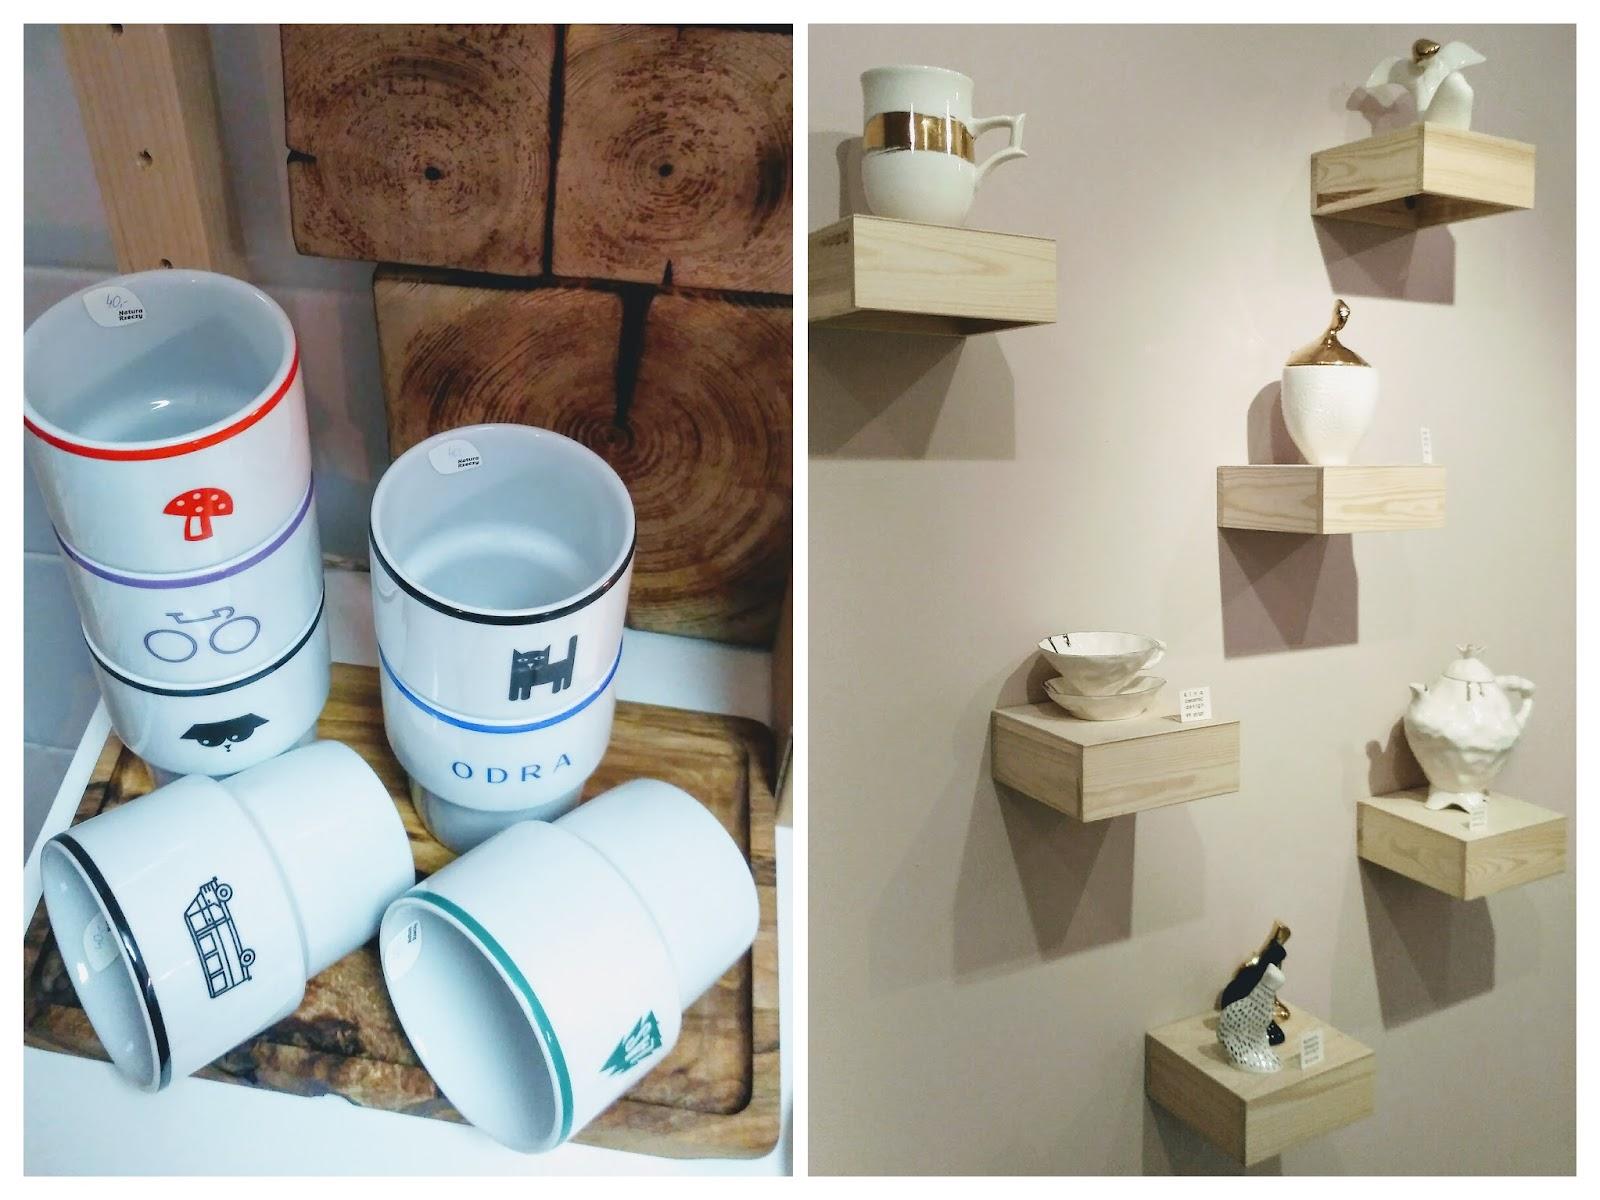 kubki MAMSAM w Natura Rzeczy | ceramika w Nado: Barbara Sniegula, Kina Ceramics